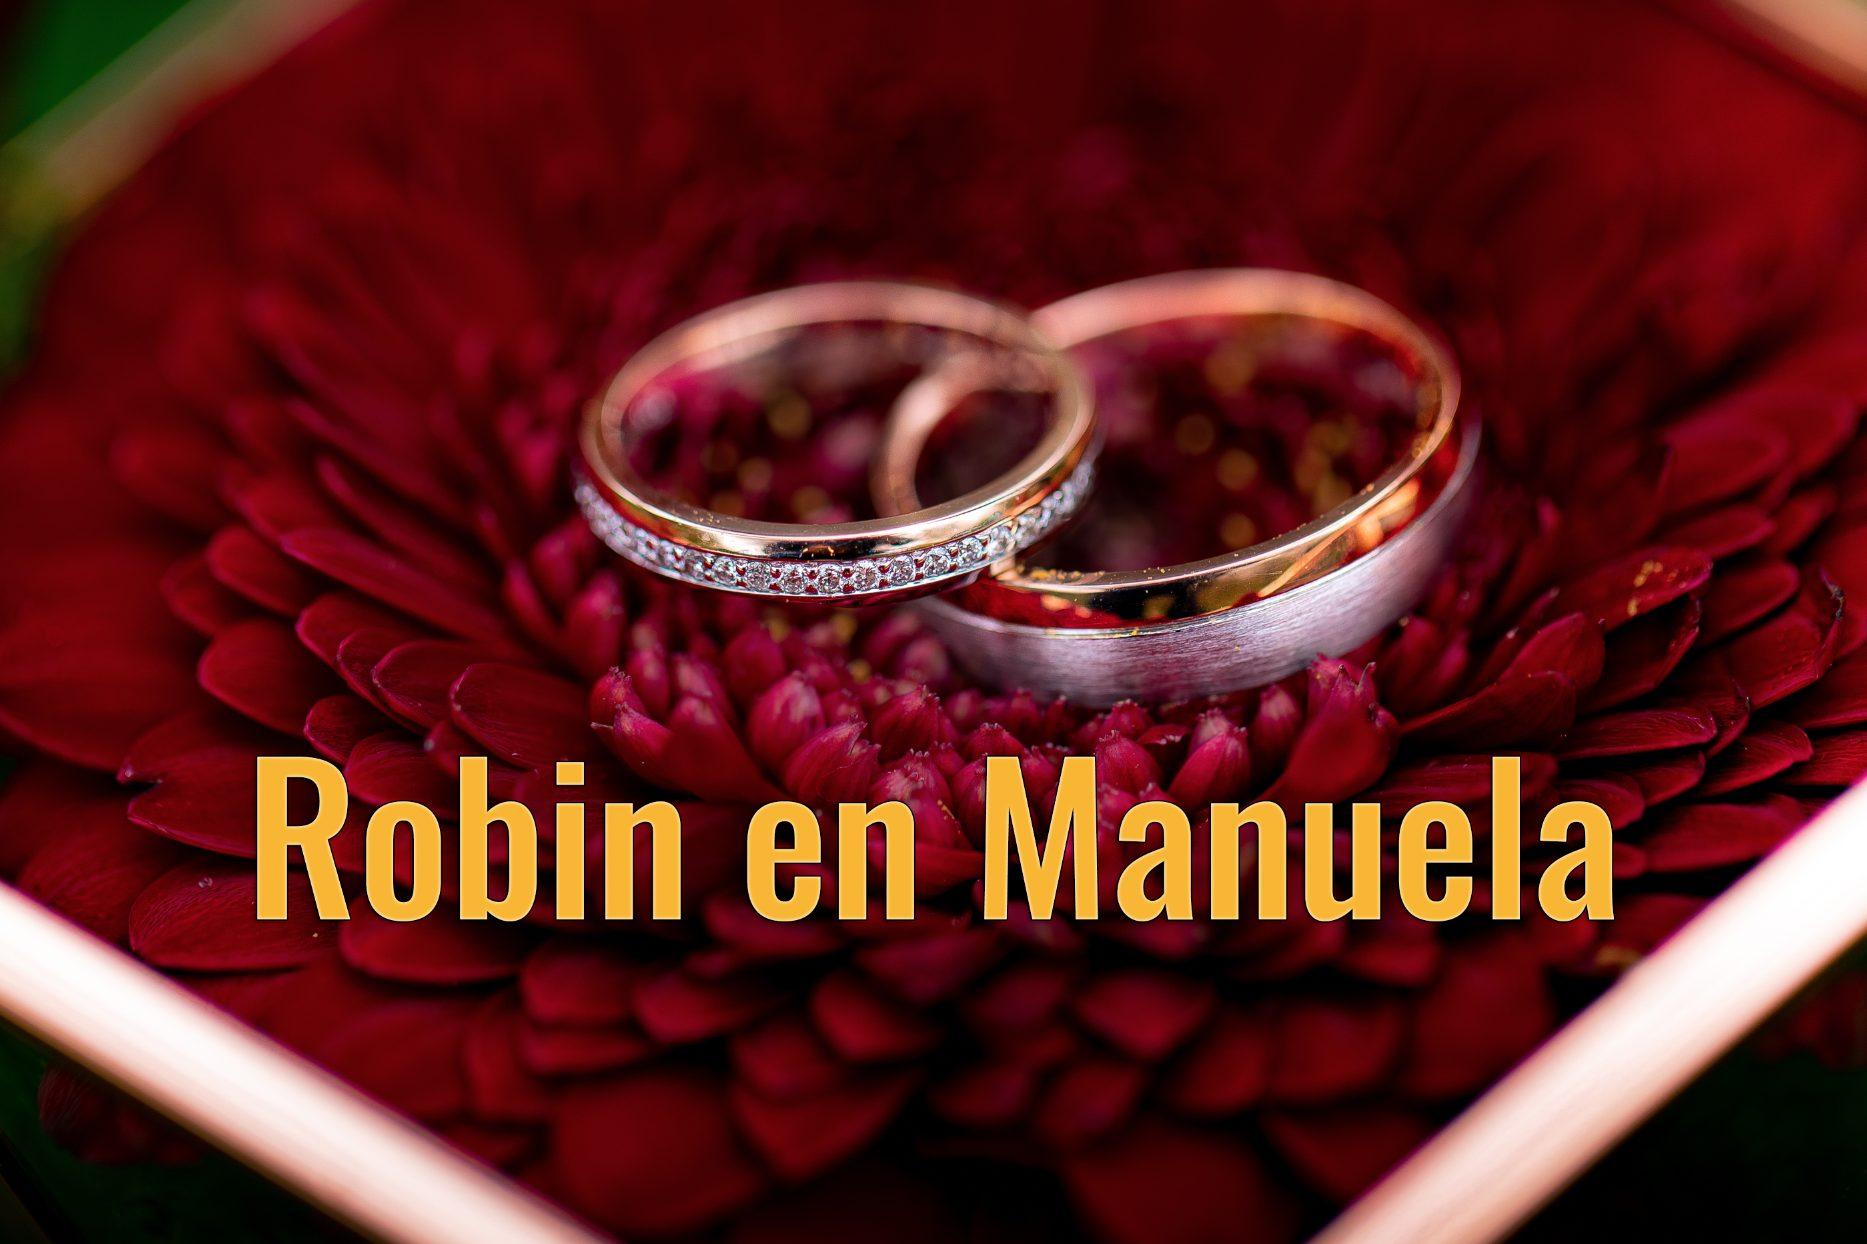 Robin en Manuela